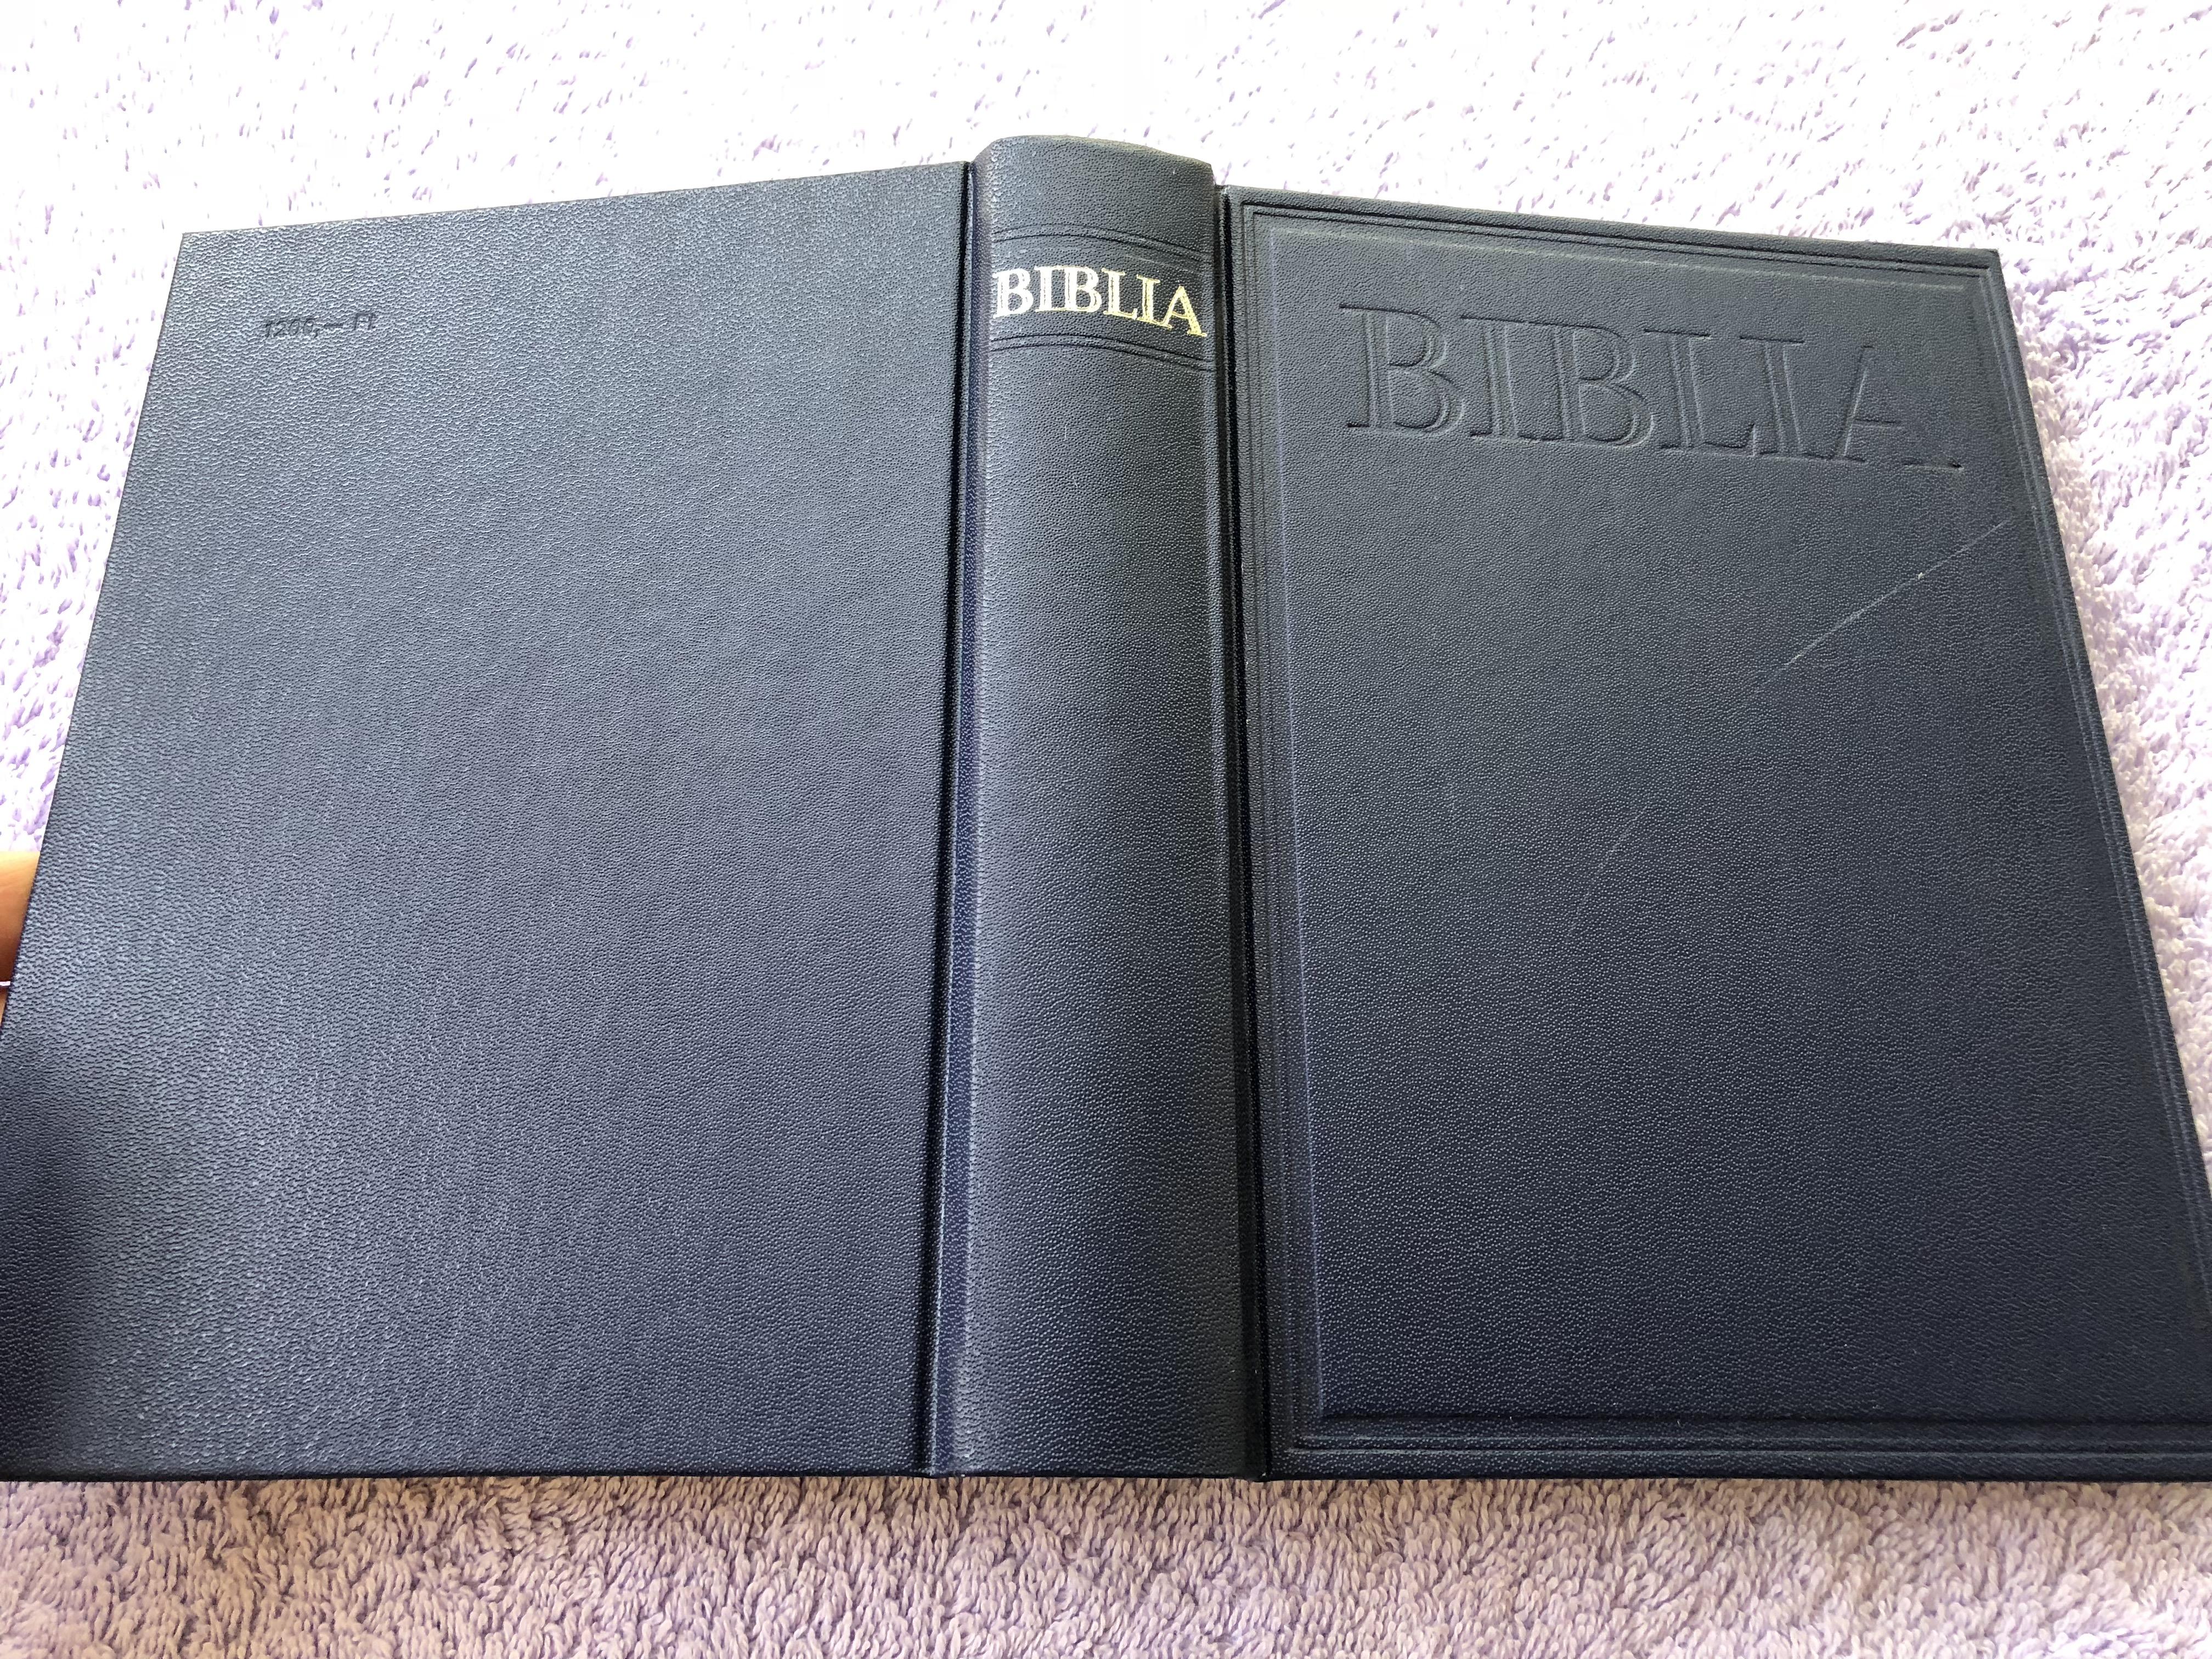 biblia-hungarian-protestant-bible-1997-print-3-.jpg